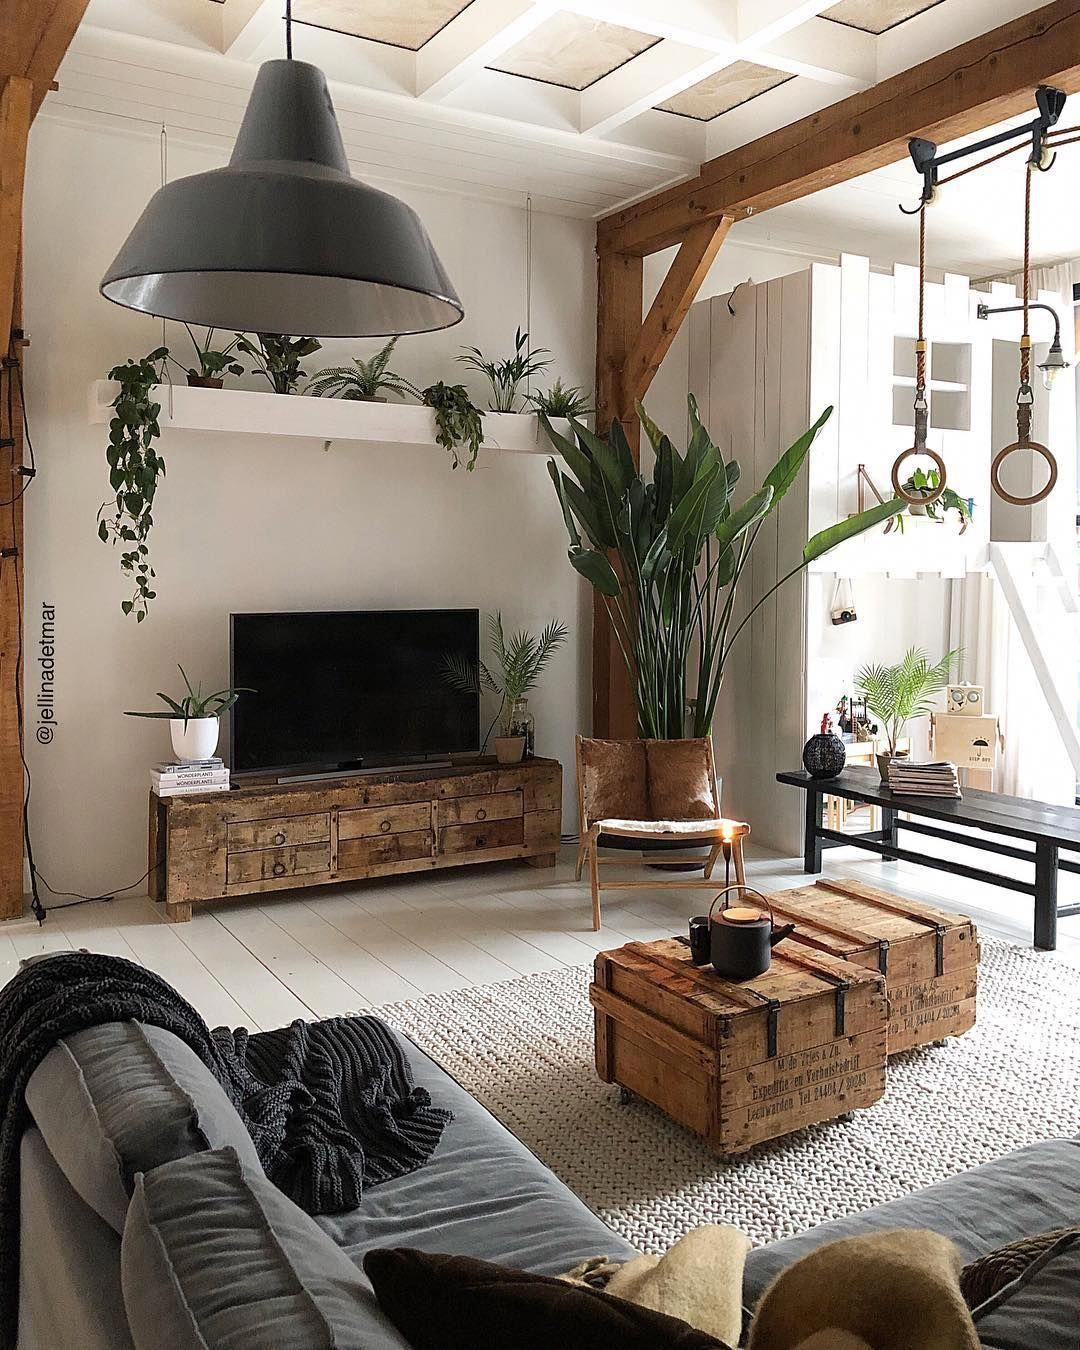 19++ Ikea living room ideas india info